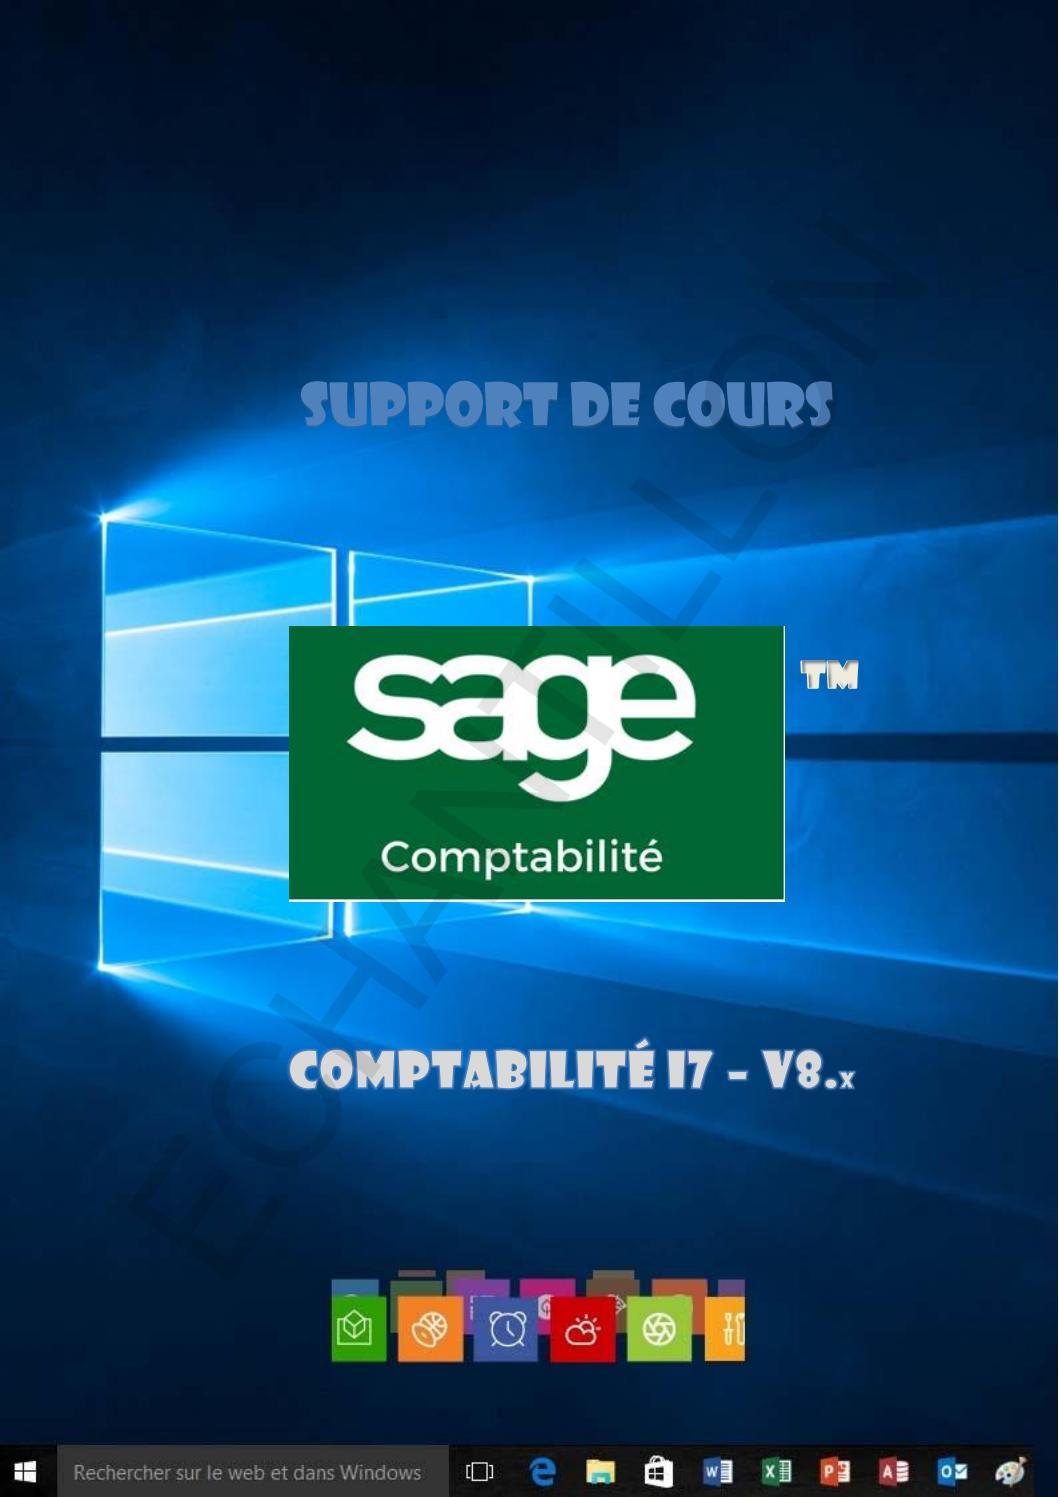 Support De Cours Sage Comptabilite I7 V8 By Joel Green Issuu